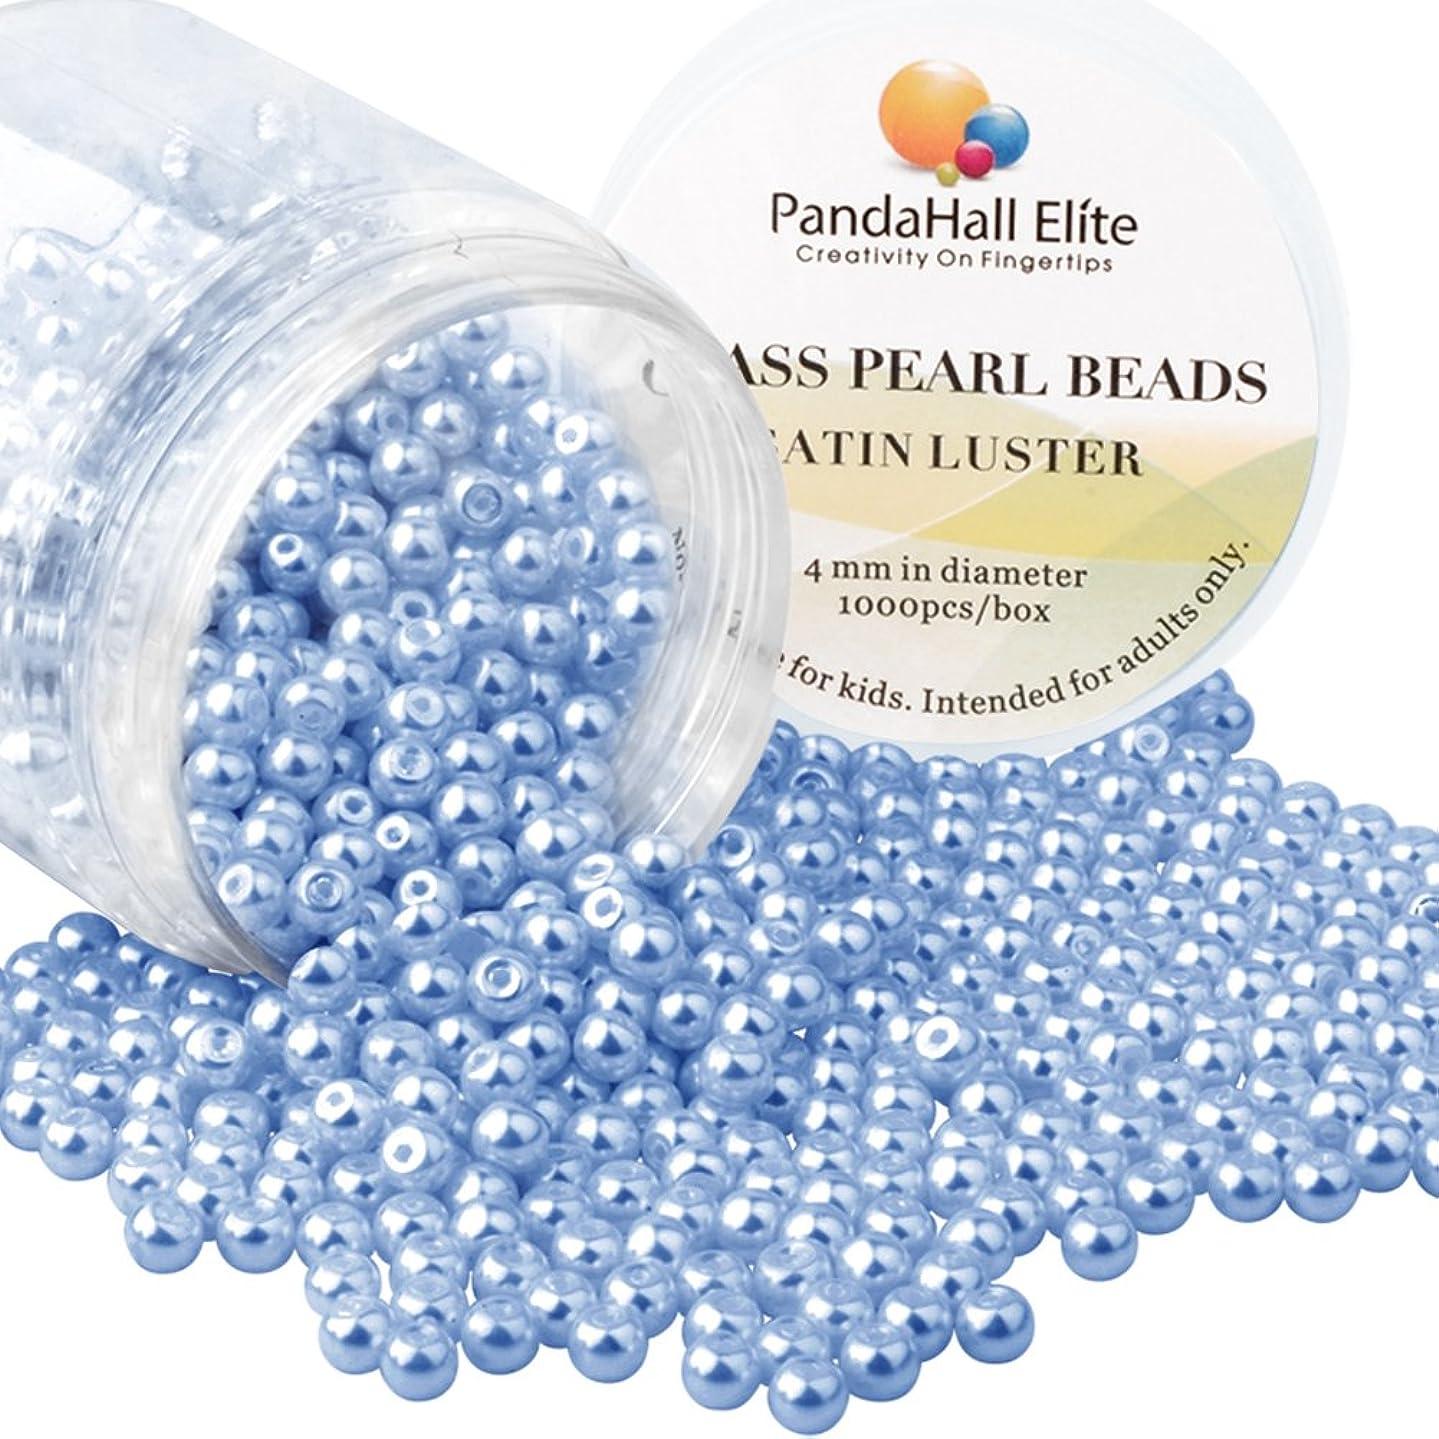 PandaHall Elite 4mm About 1000Pcs Tiny Satin Luster Glass Pearl Round Beads Assortment Lot for Jewelry Making Round Box Kit Cornflower blue